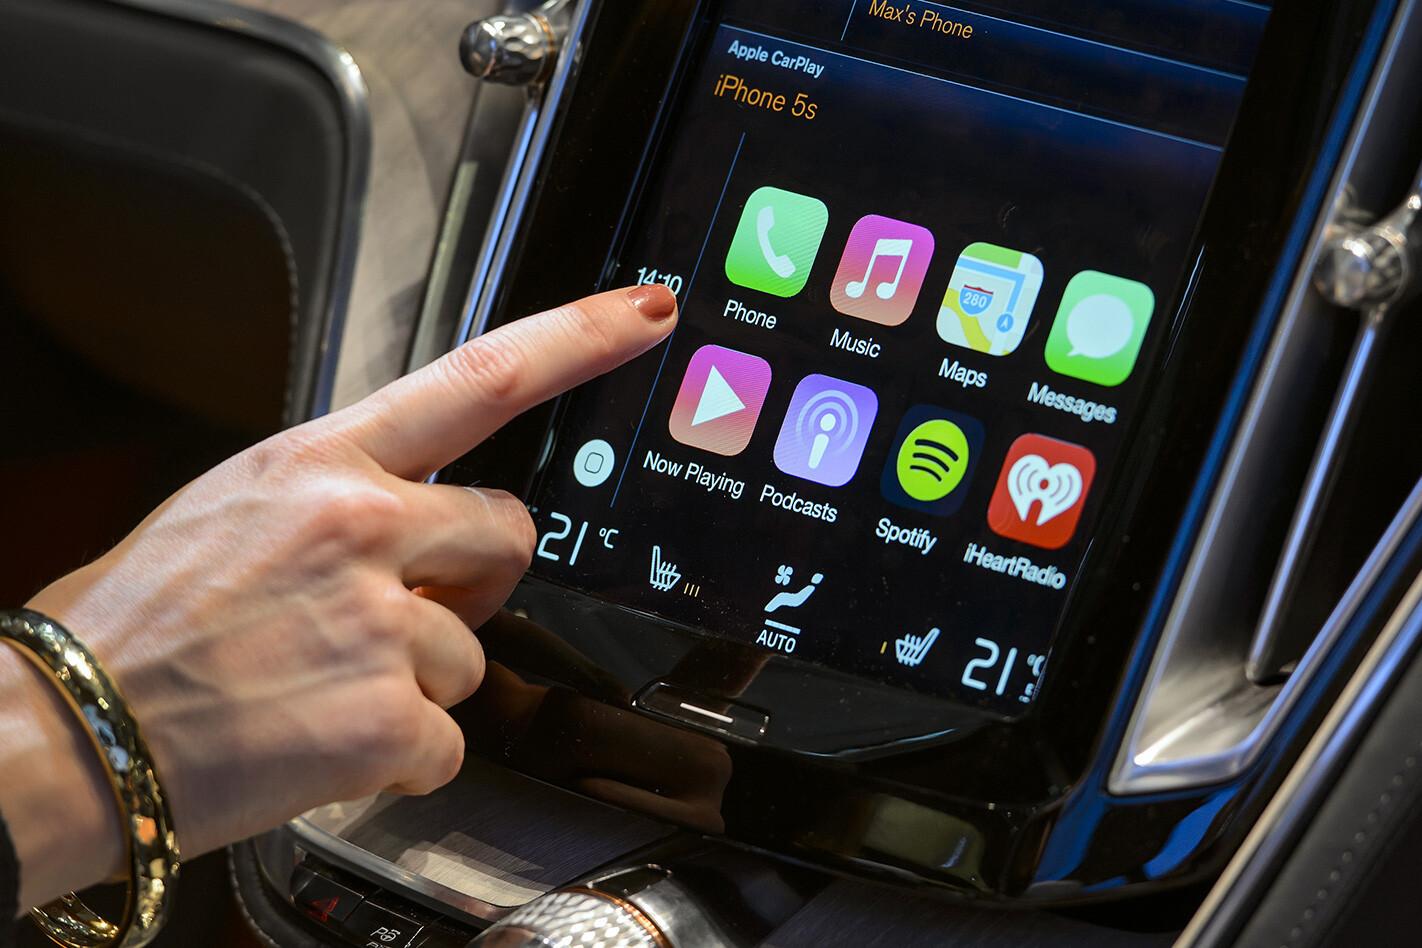 Apple Carplay V Android Auto Apple Carplay Motor Show Jpg